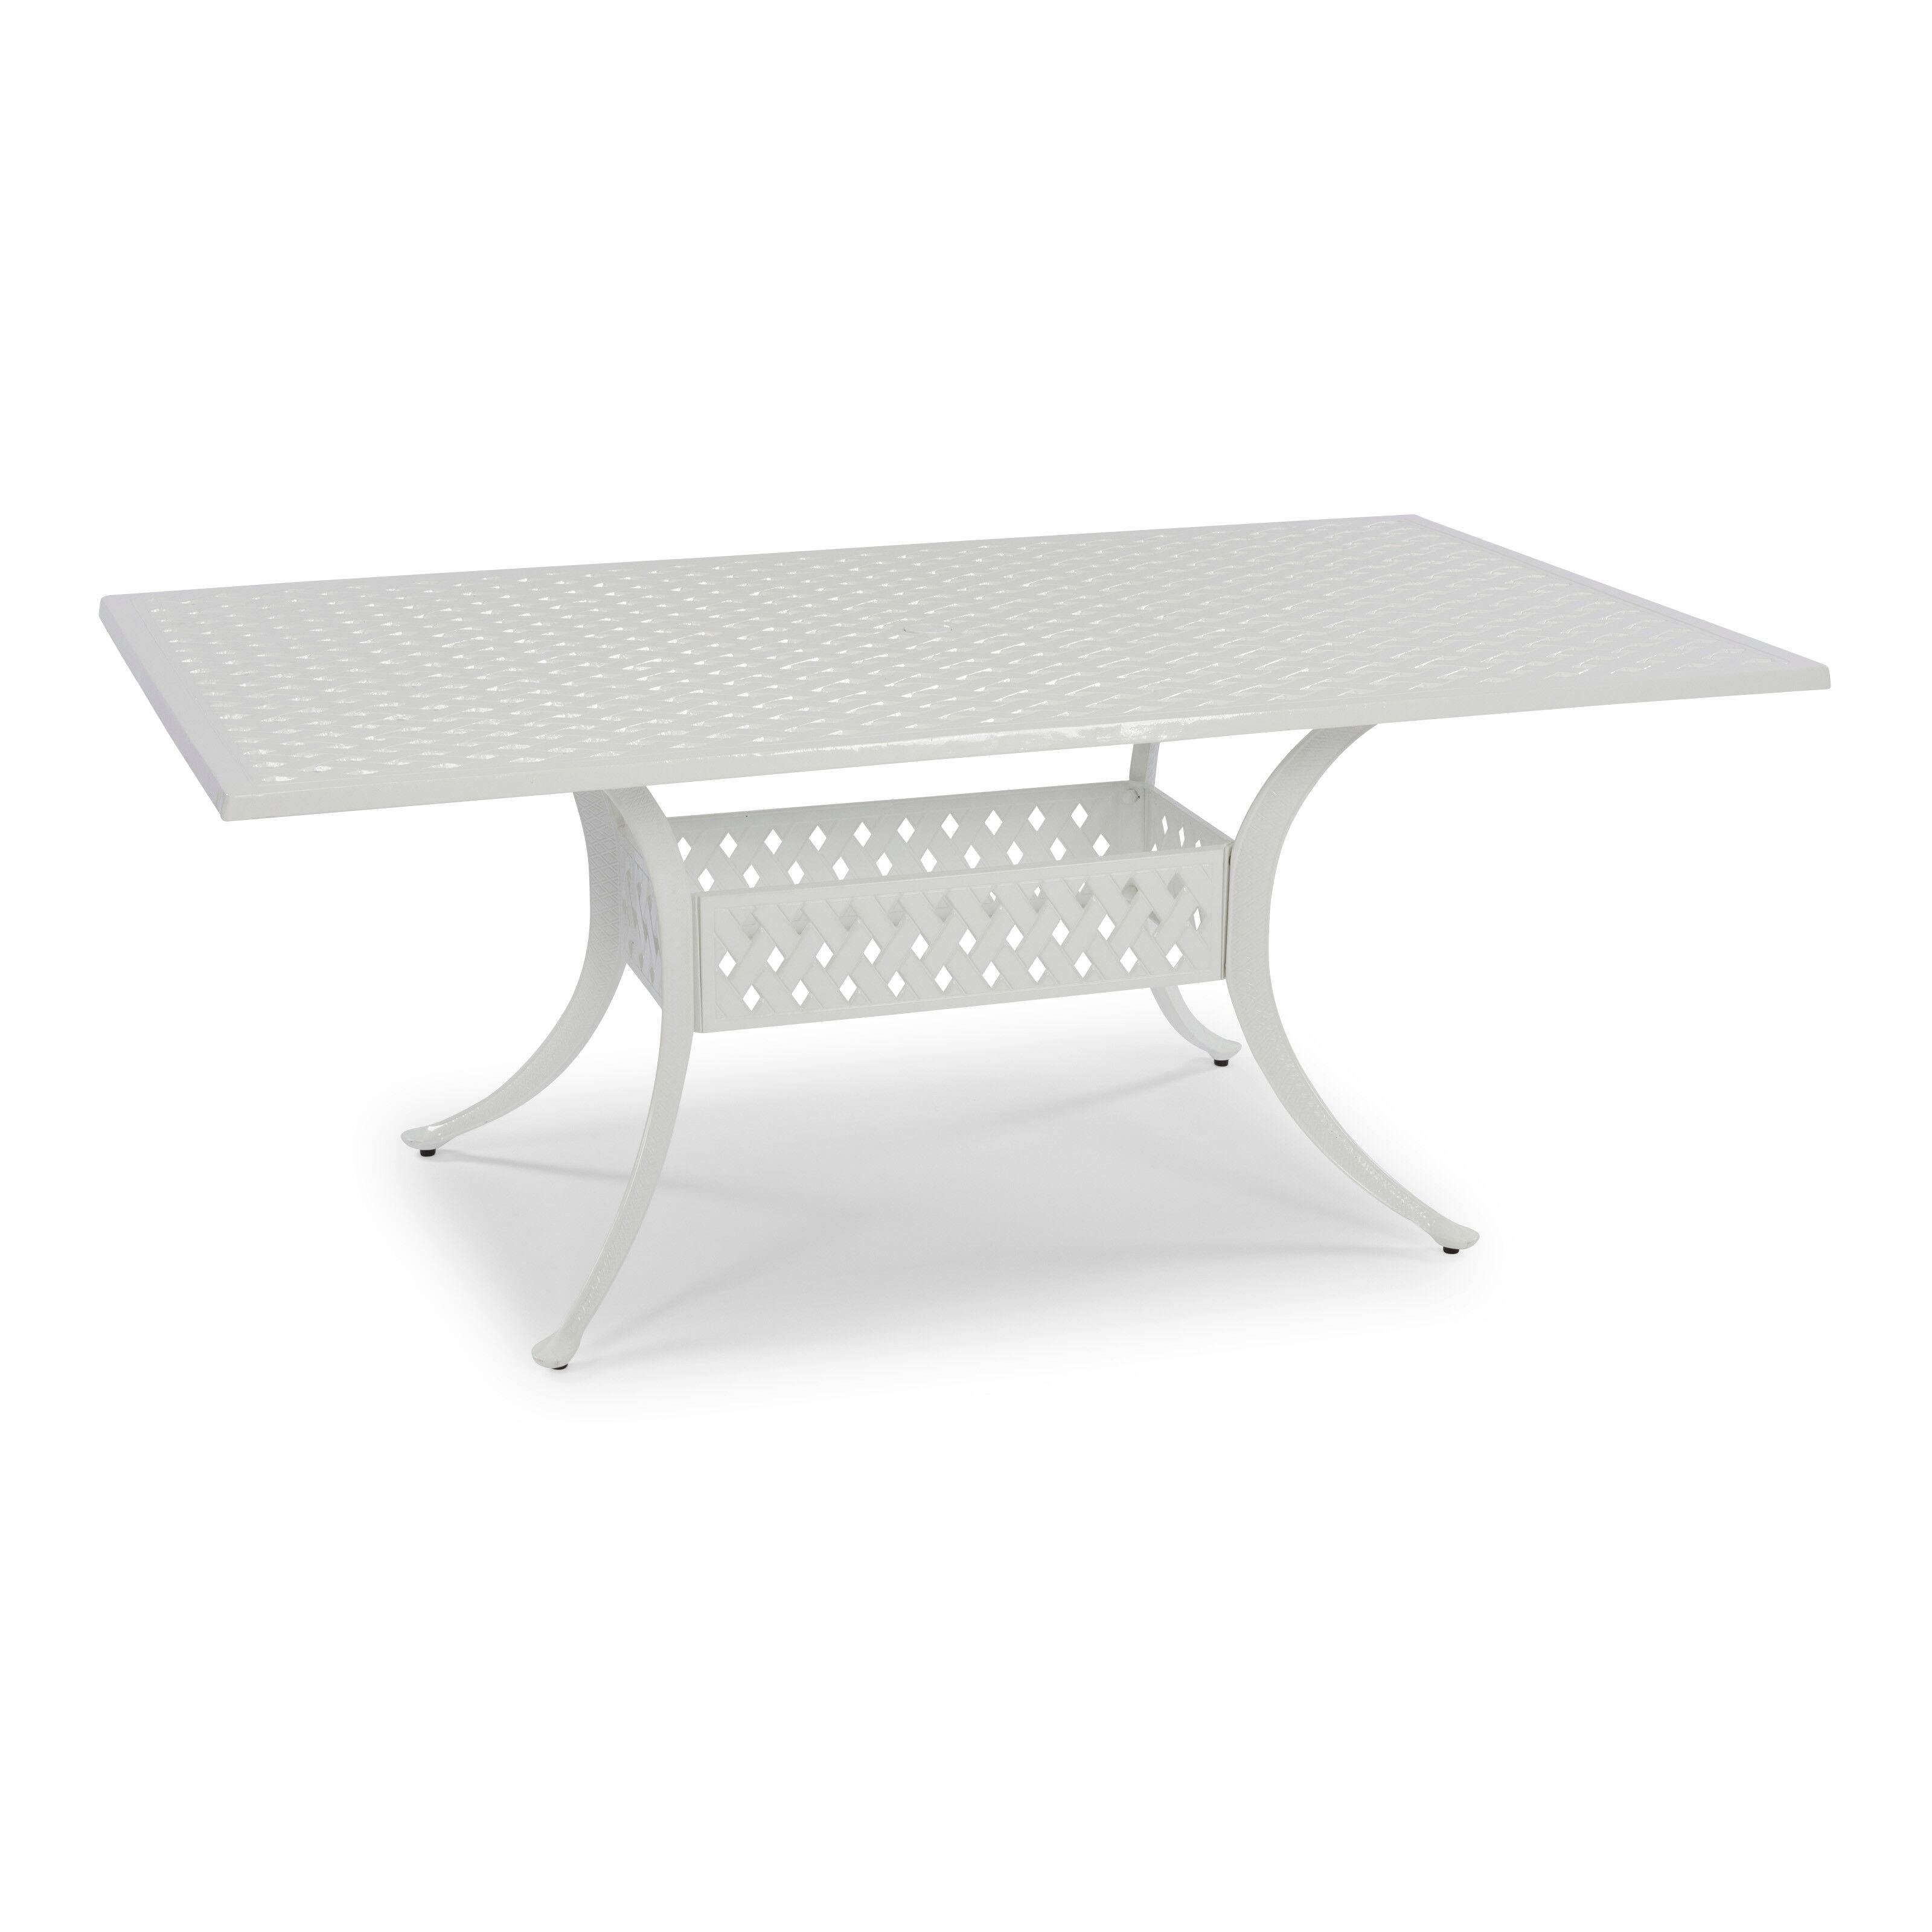 Home Styles La Jolla Cast Aluminum Outdoor White Rectangular Dining Table Walmart Com Walmart Com